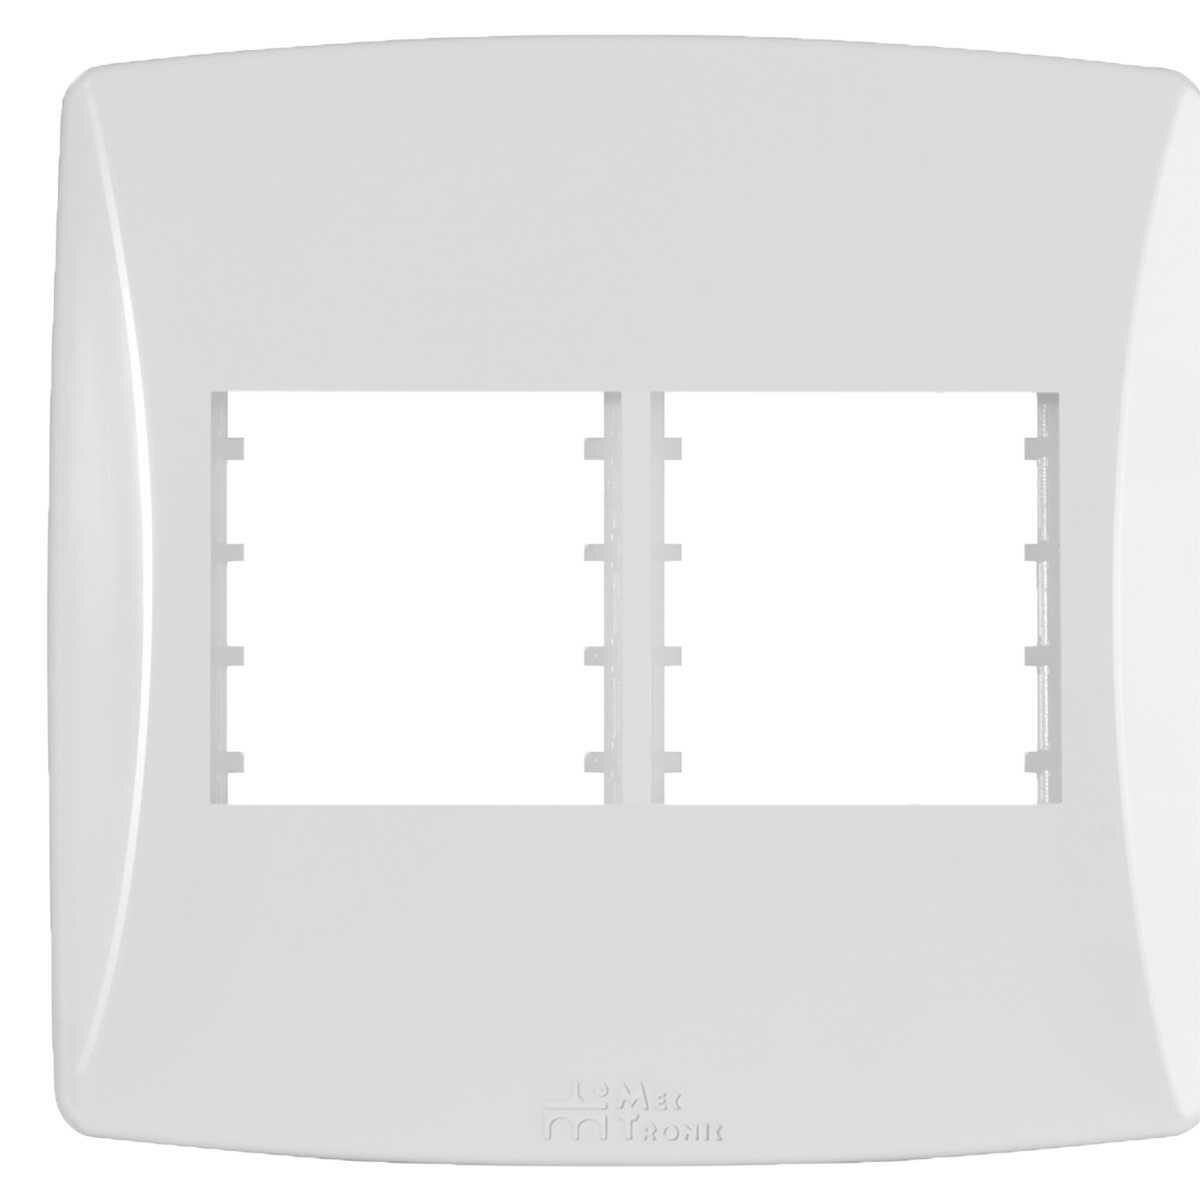 Placa 4X4 4 Postos Separado Horizontal Branco Petra